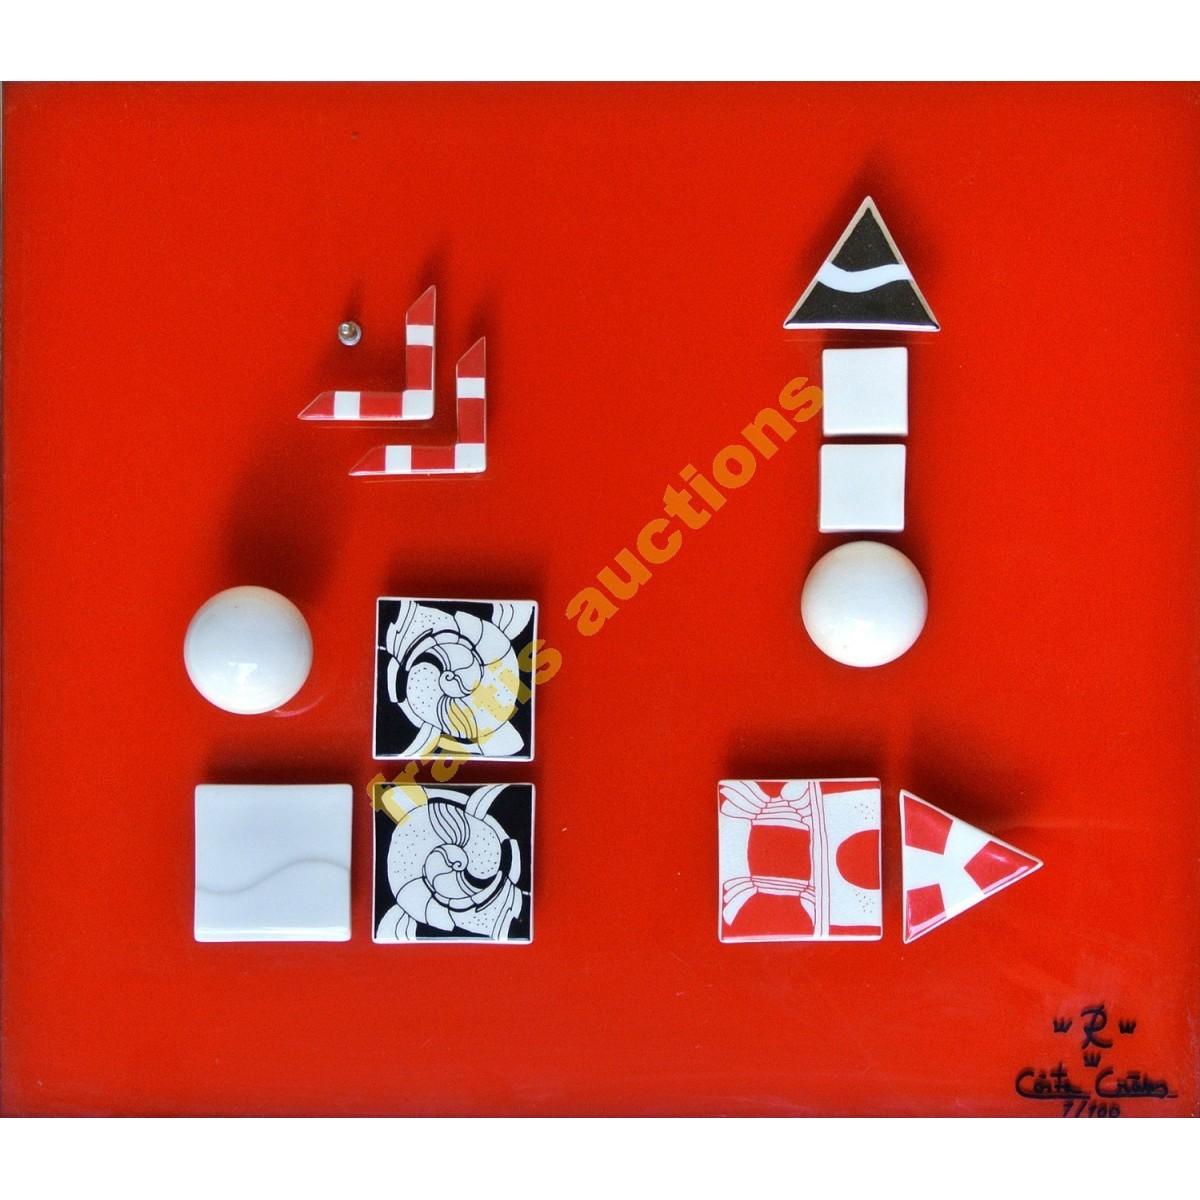 ROSTRAND  Porcelain. Τρεις συνθέσεις από πορσελάνη μετάλλο επί γυάλινης επιφάνειας σε μεταλλικές κορνίζες